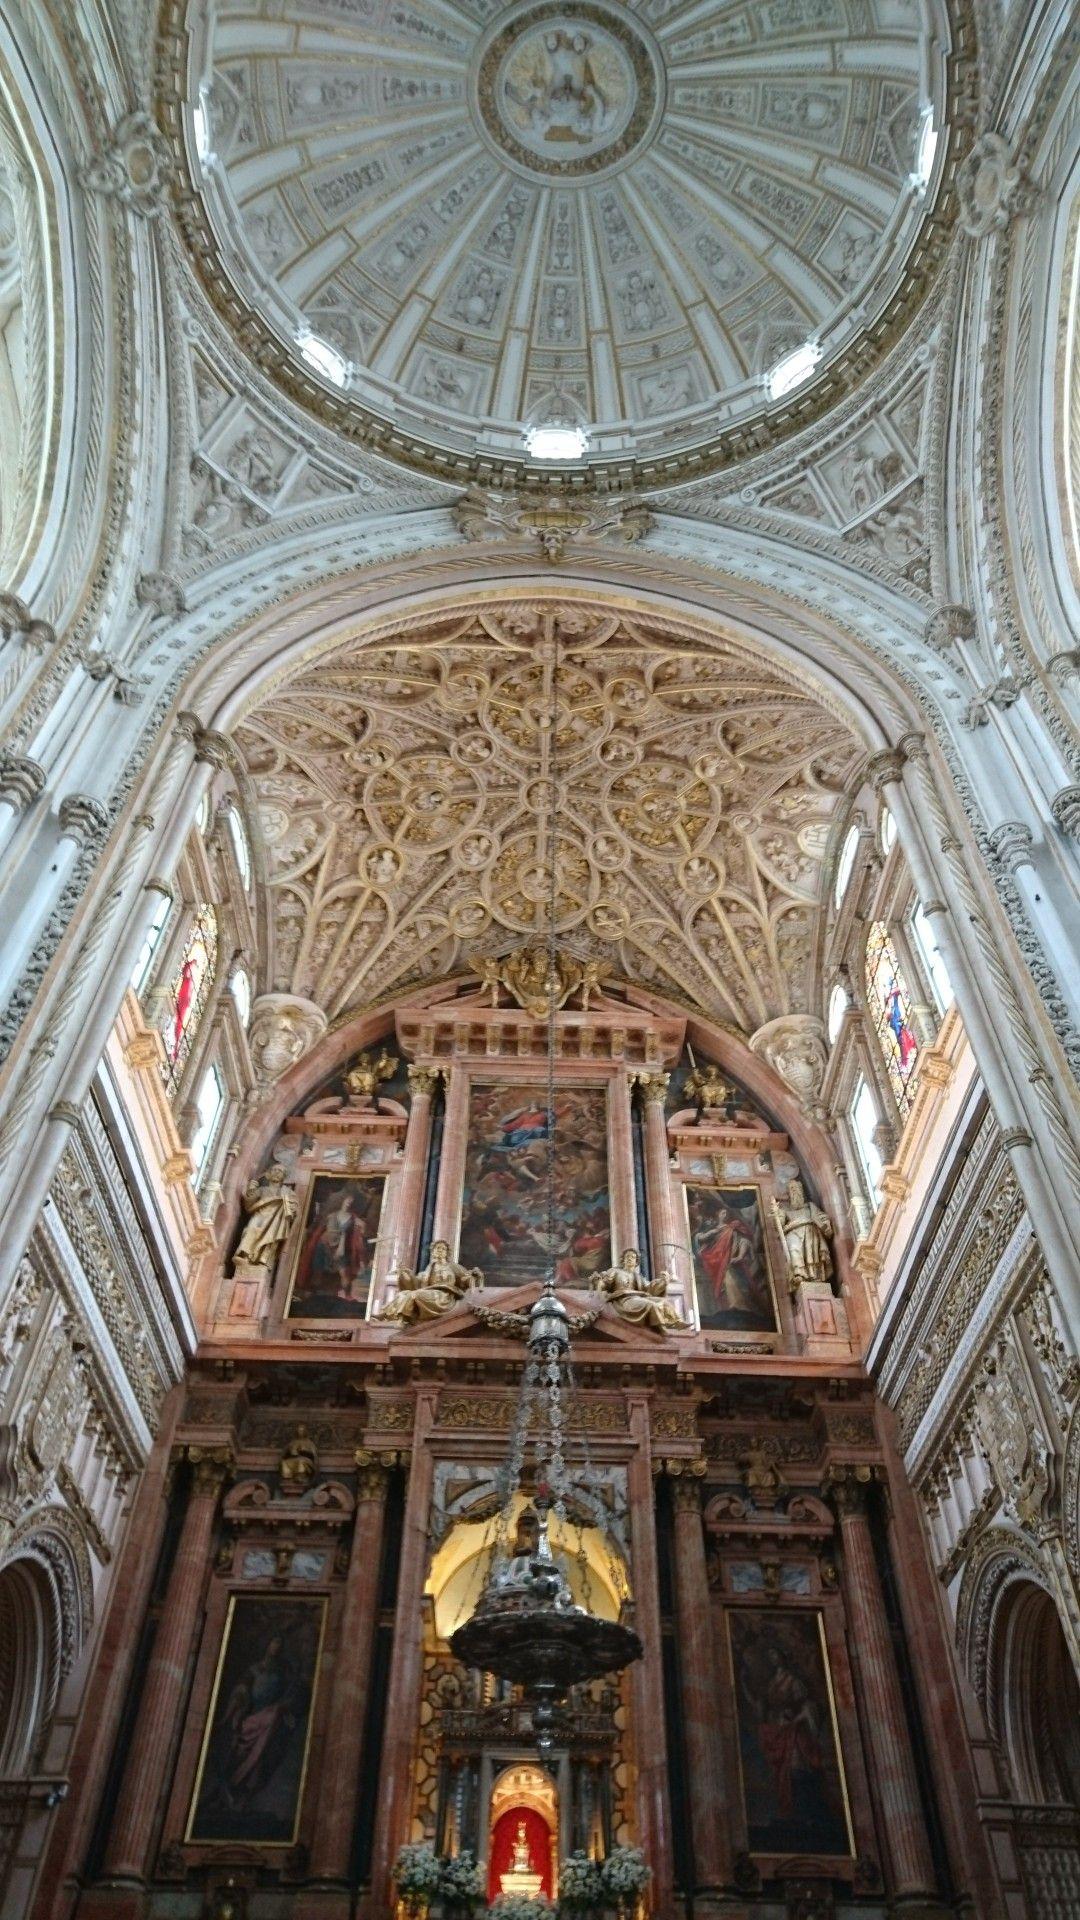 Mezquita-Catedral de Córdoba, Spain